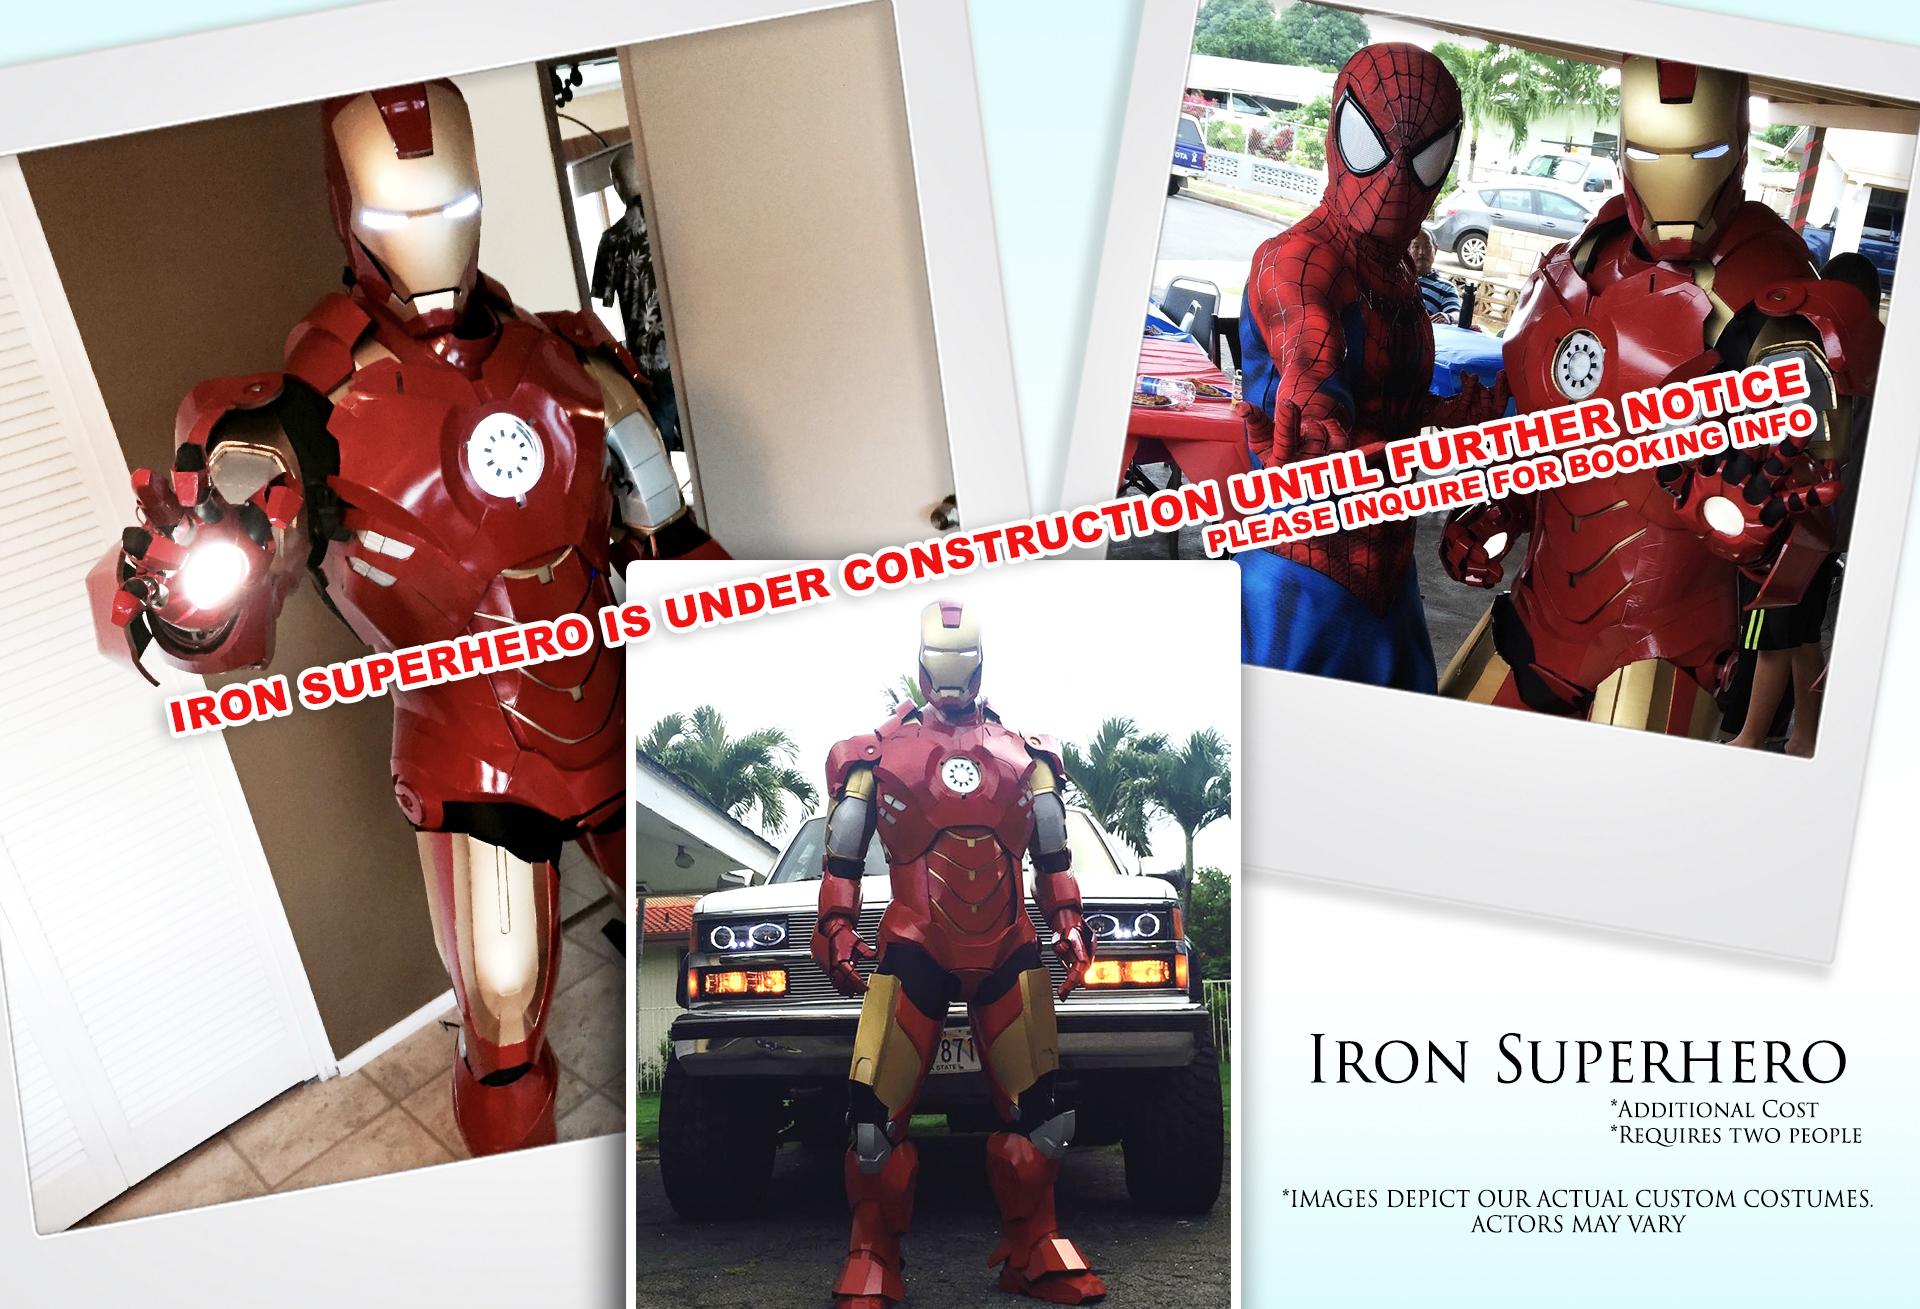 Iron Superhero (Under Construction)